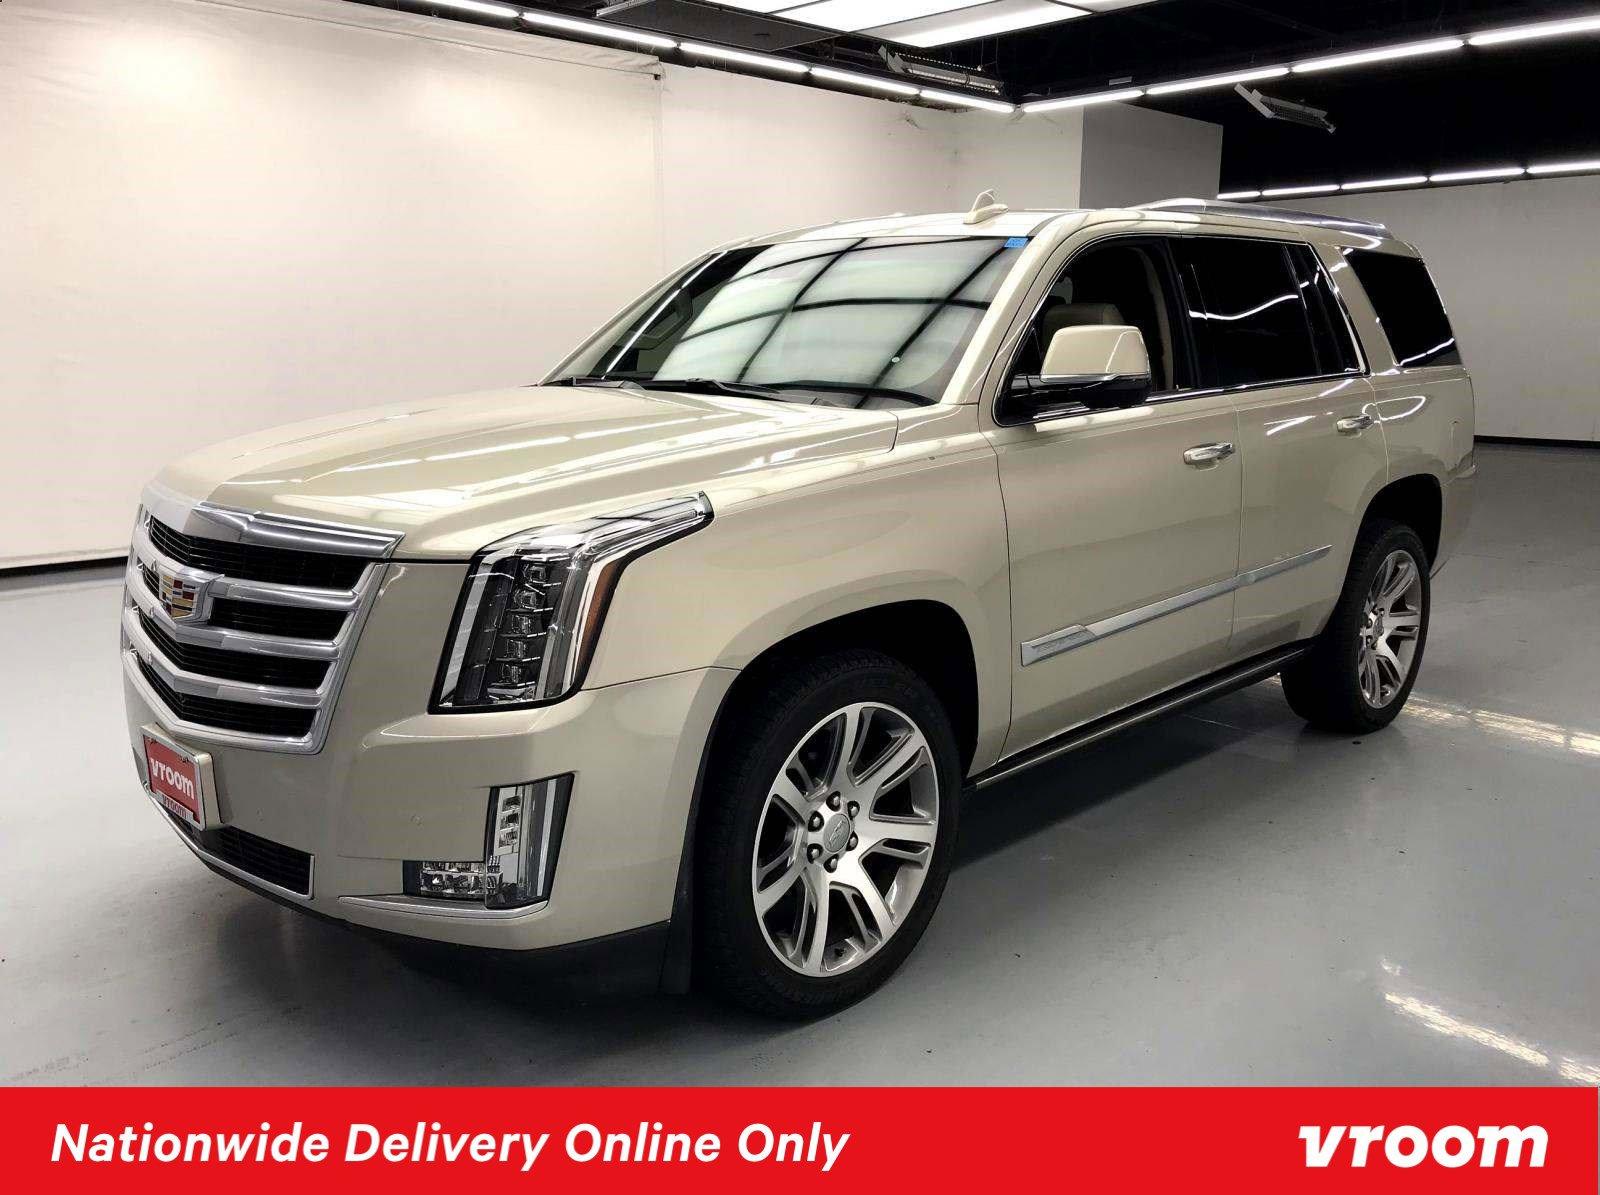 2016 Cadillac Escalade 2WD Premium image